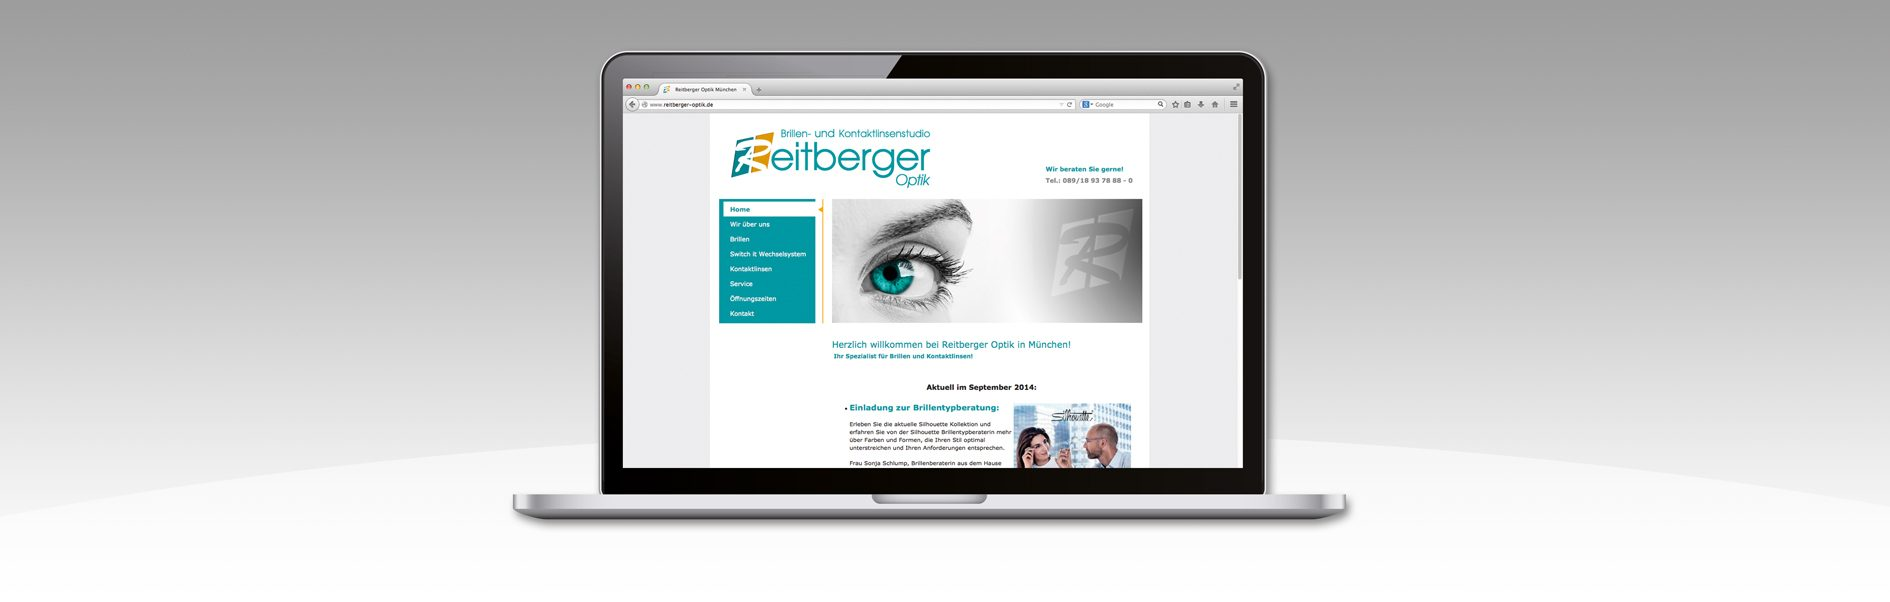 Hier ist die Home der Reitberger Optik website abgebildet.